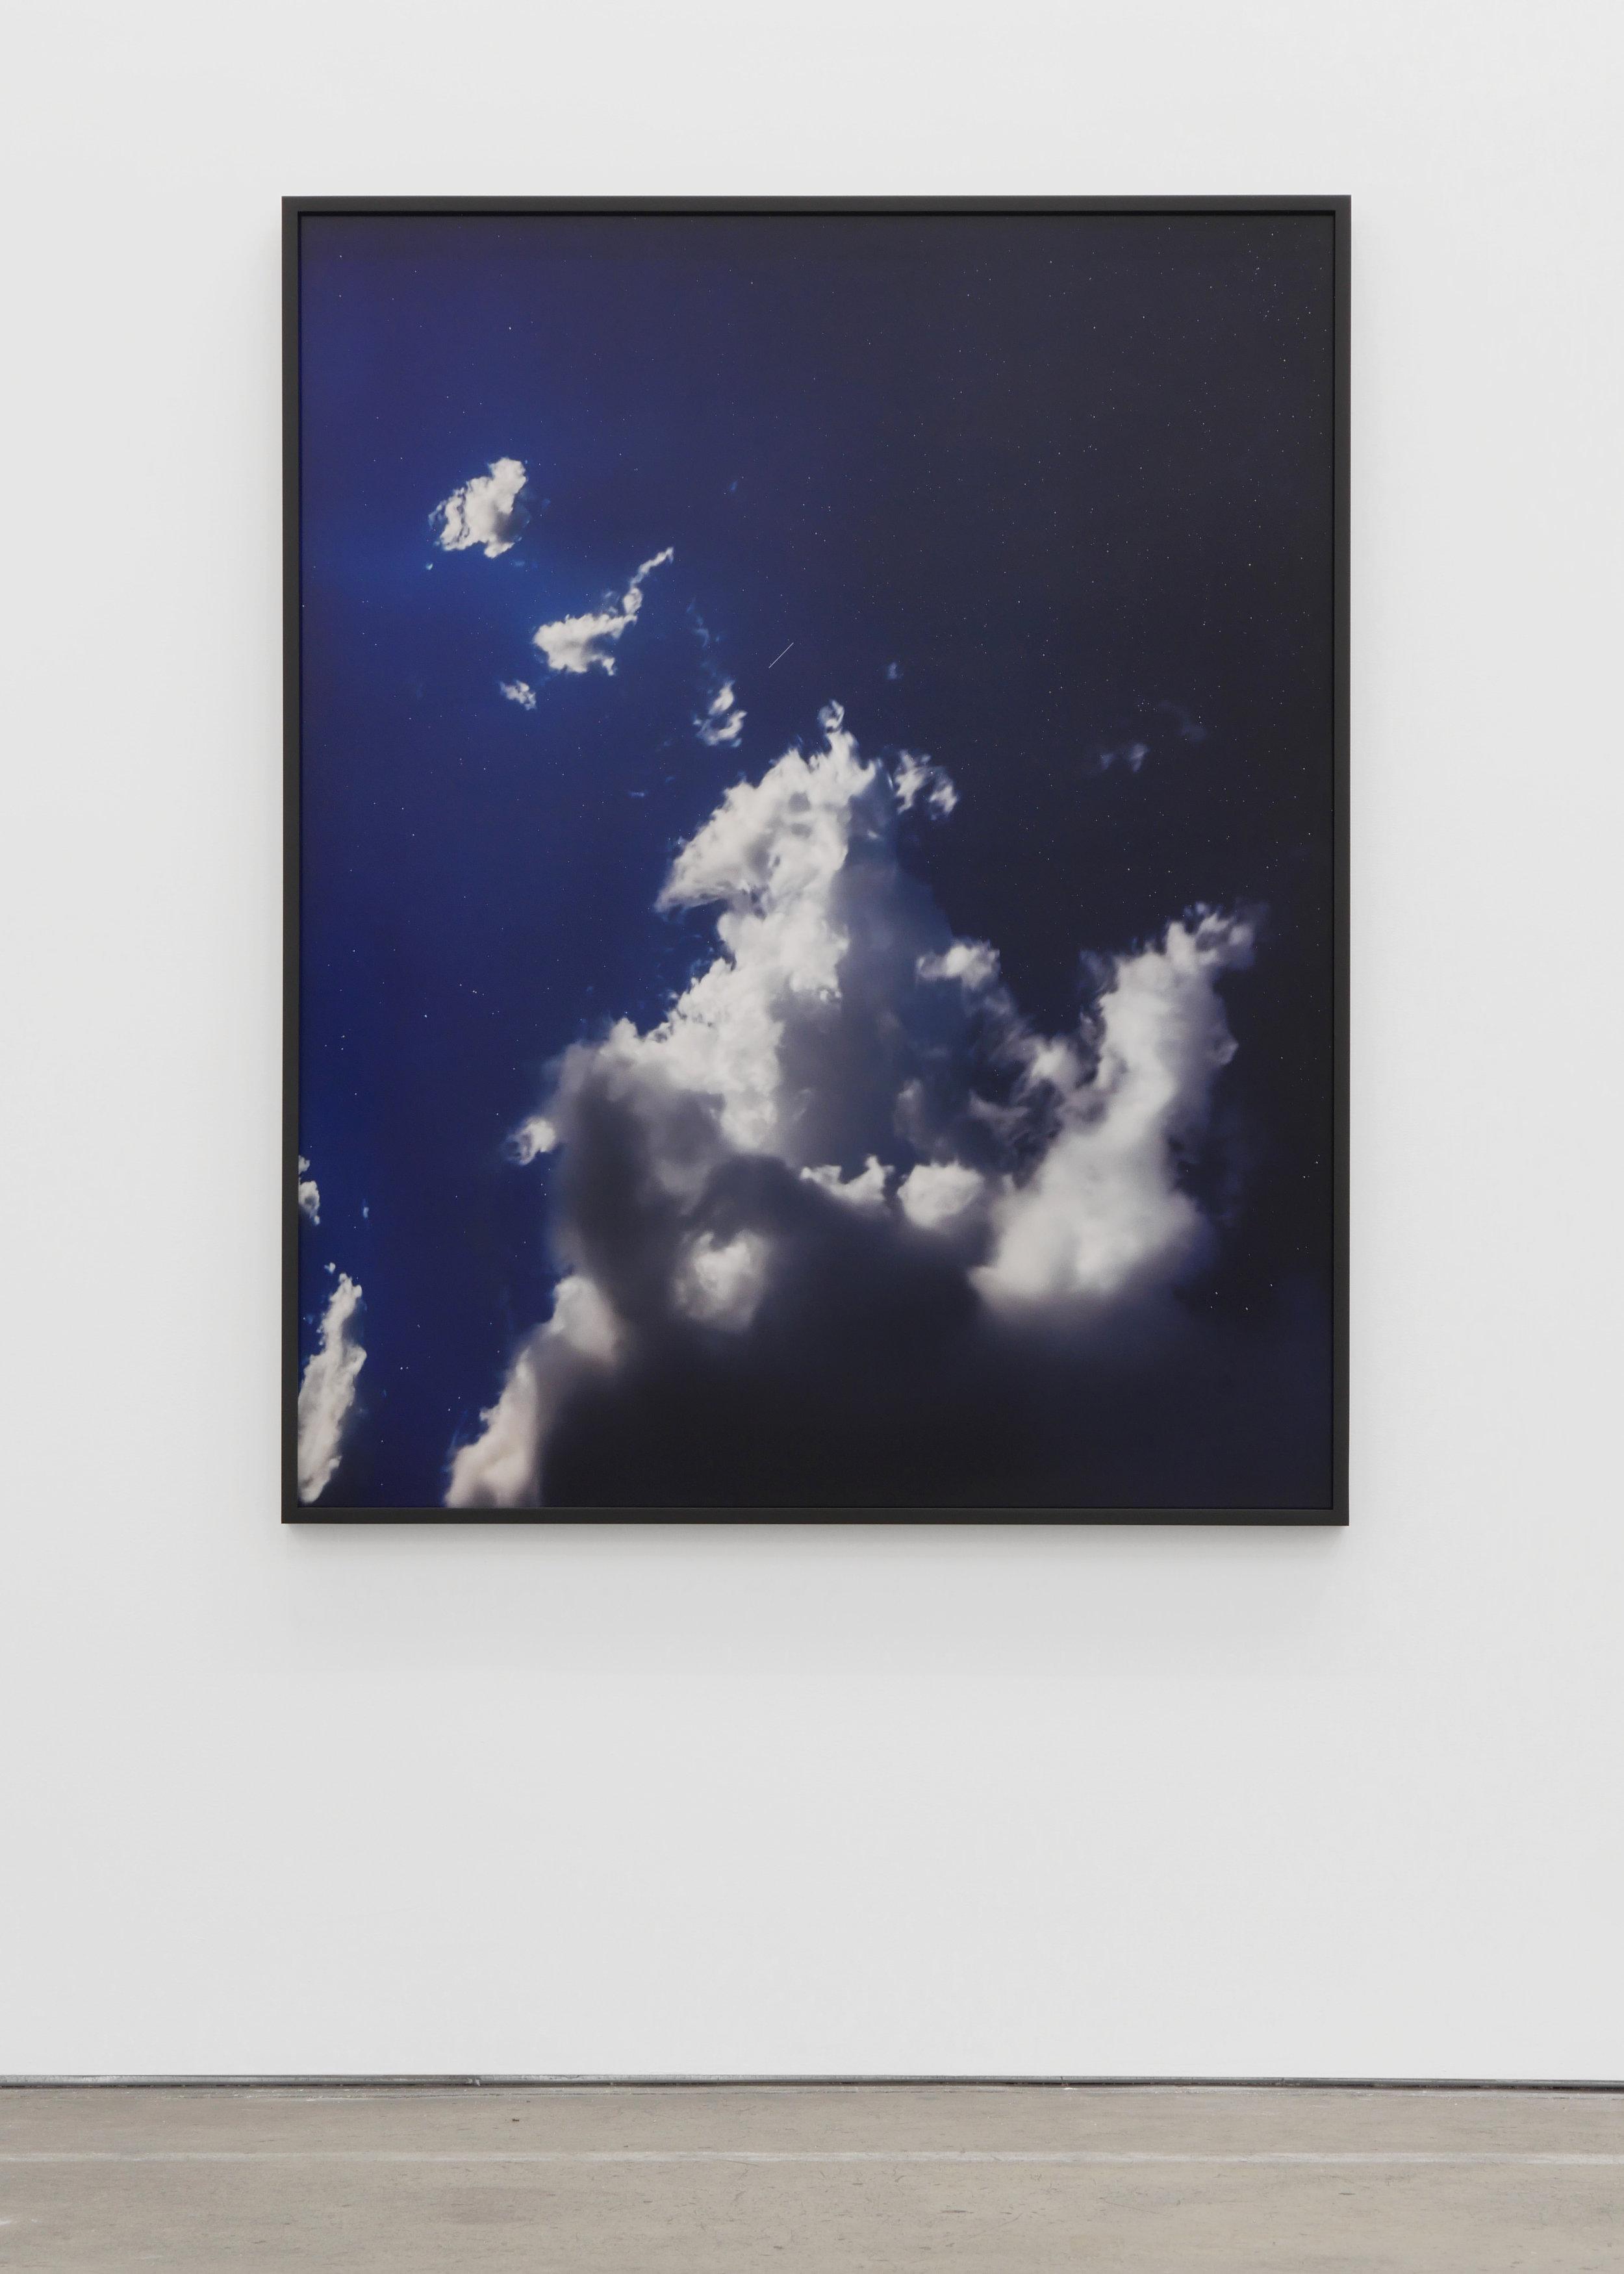 Trevor Paglen,INTRUDER 12A in Vulpecula (Ocean Reconnaissance Satellite; USA 274), 2017; dye sublimation print, white semi-matte. 60 x 48 in.